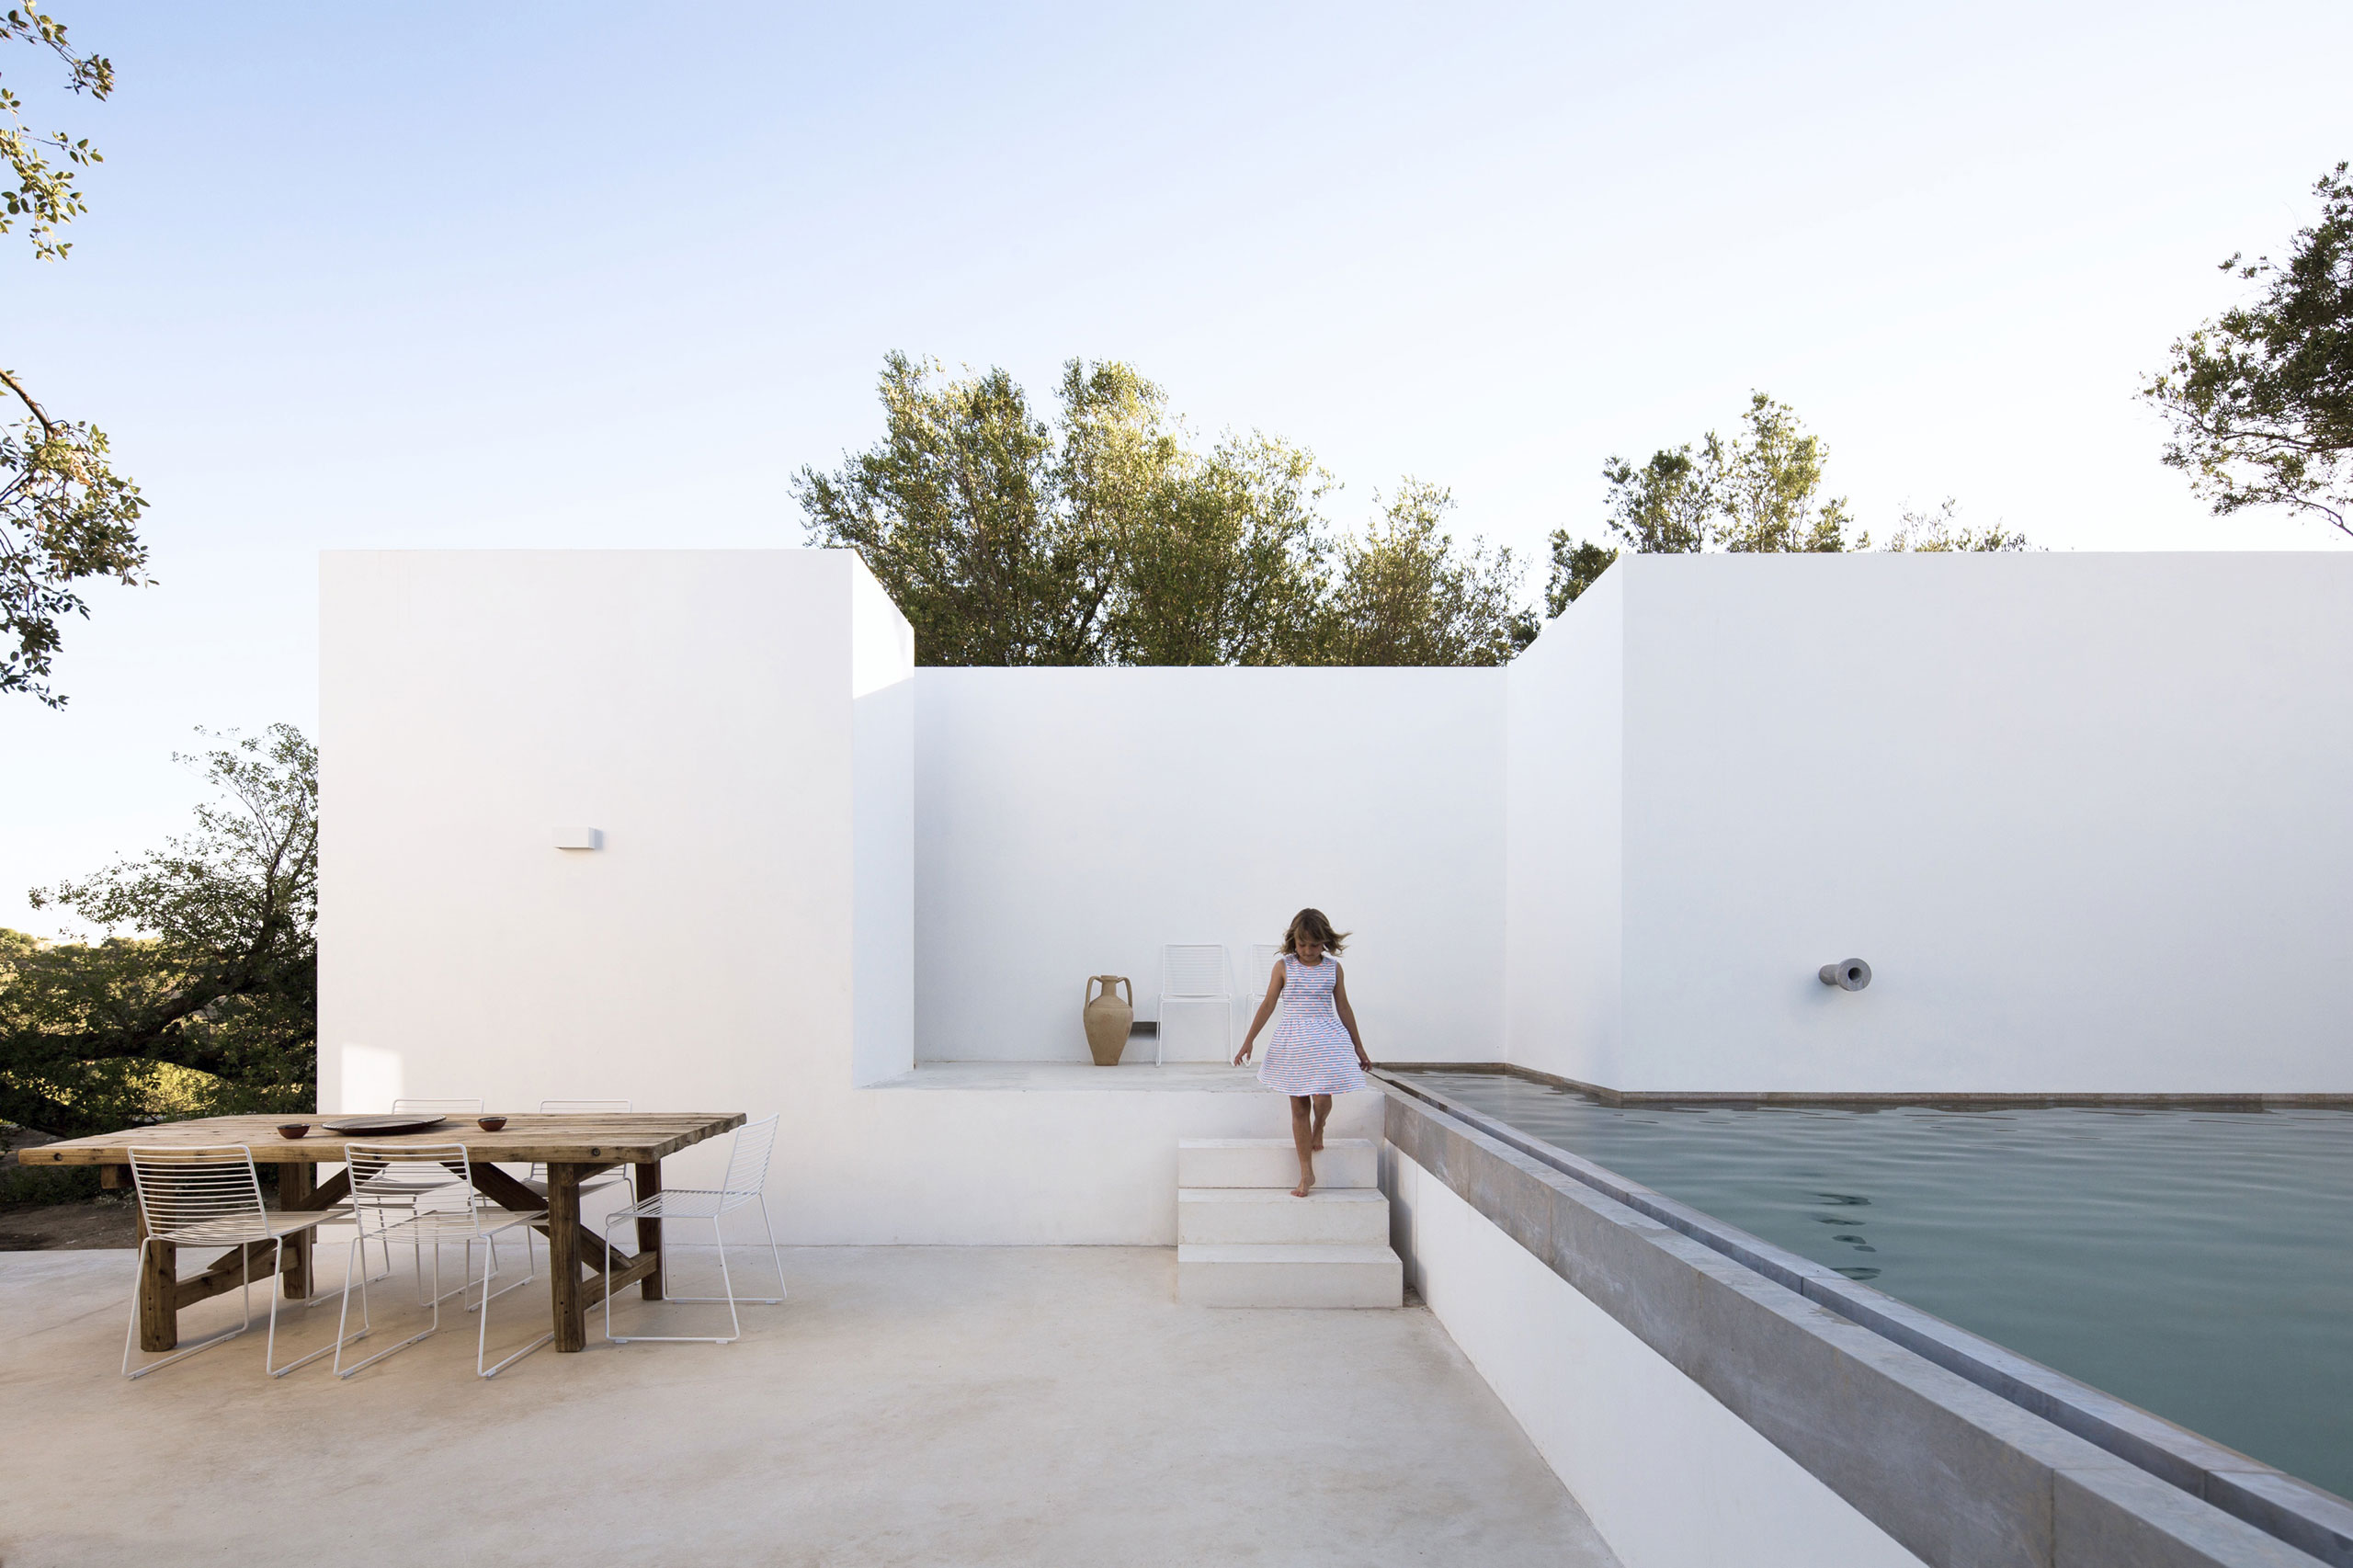 Zalig-Algarve-Casa-Luum-317-2